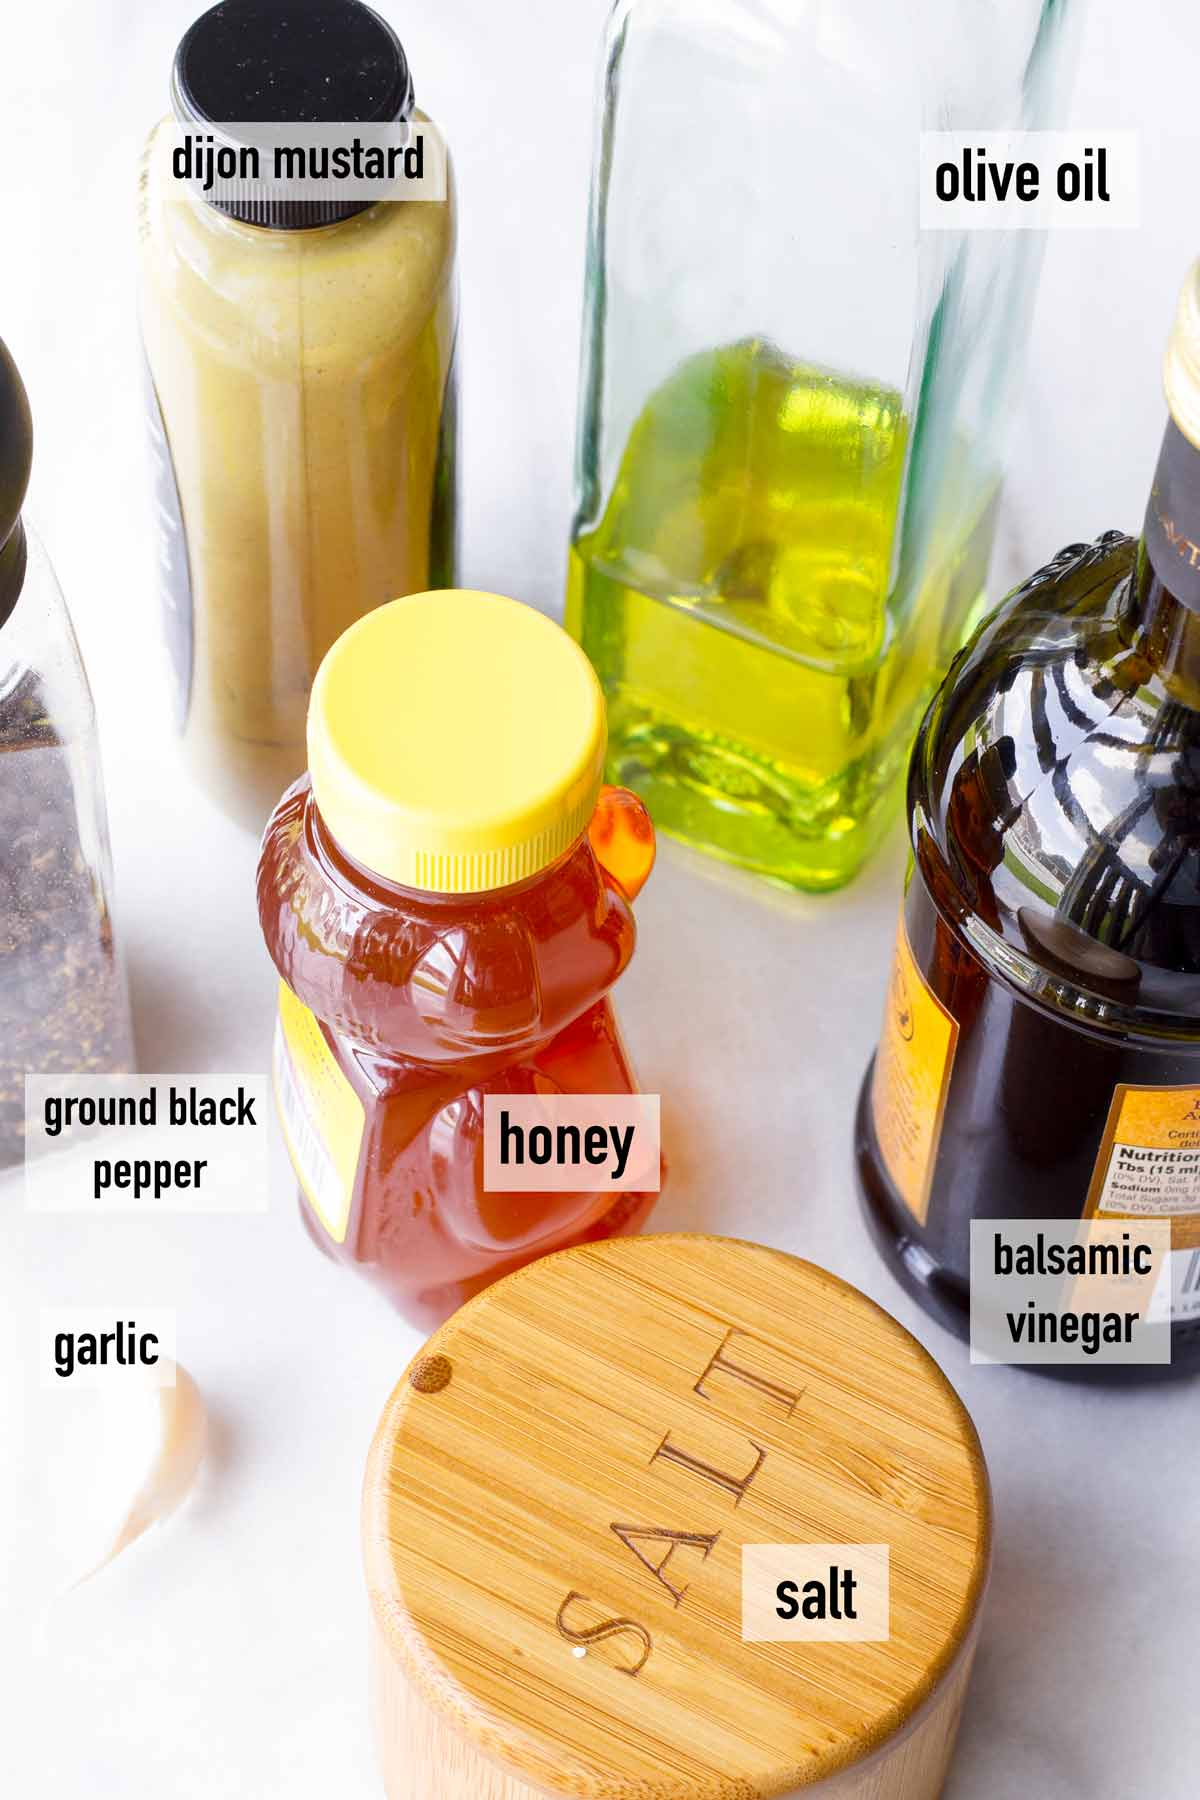 ingredients including mustard, olive oil, balsamic, honey, salt, garlic, pepper